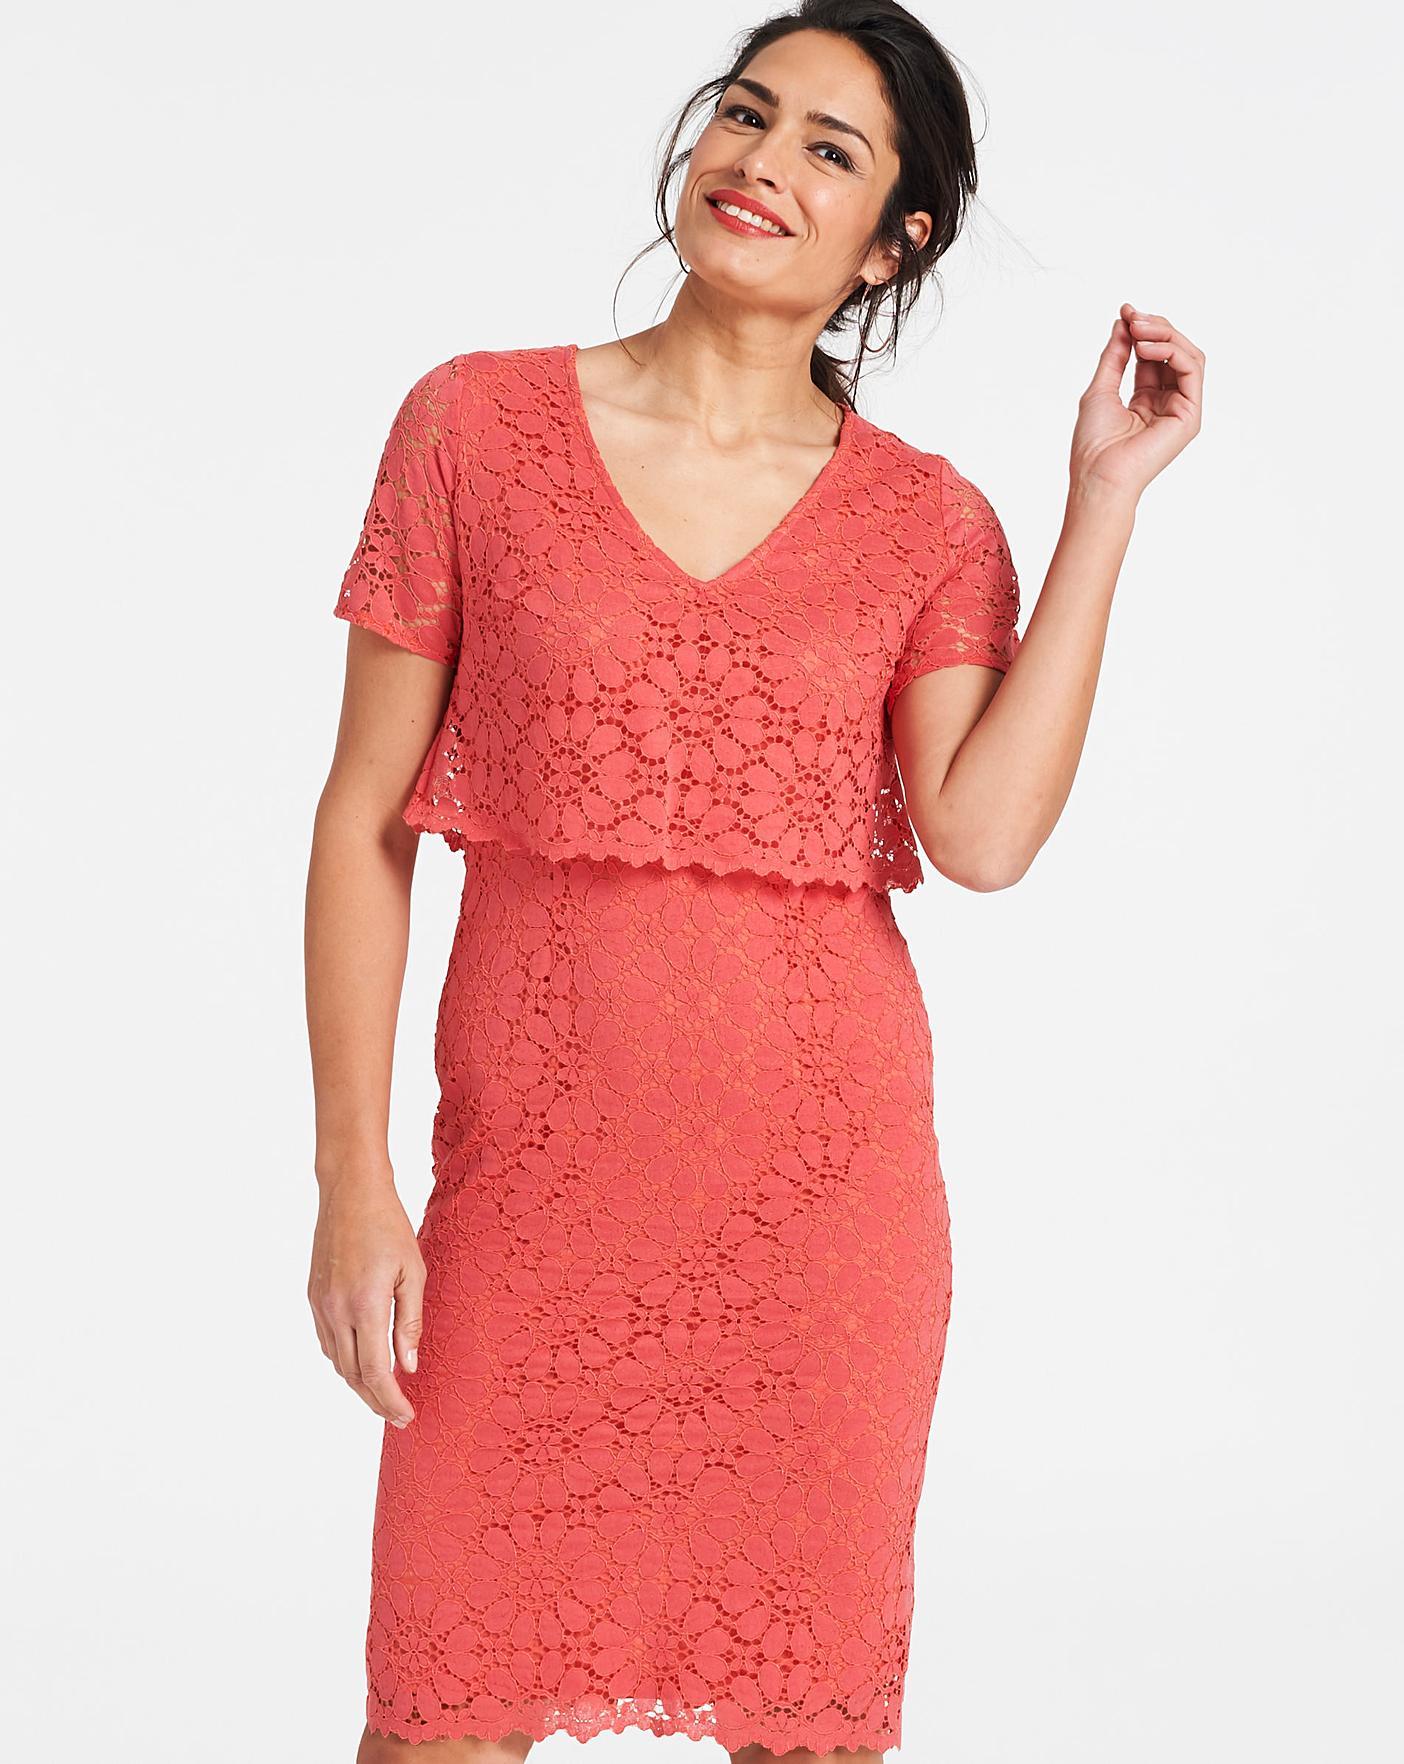 Coral Lace Layered Dress